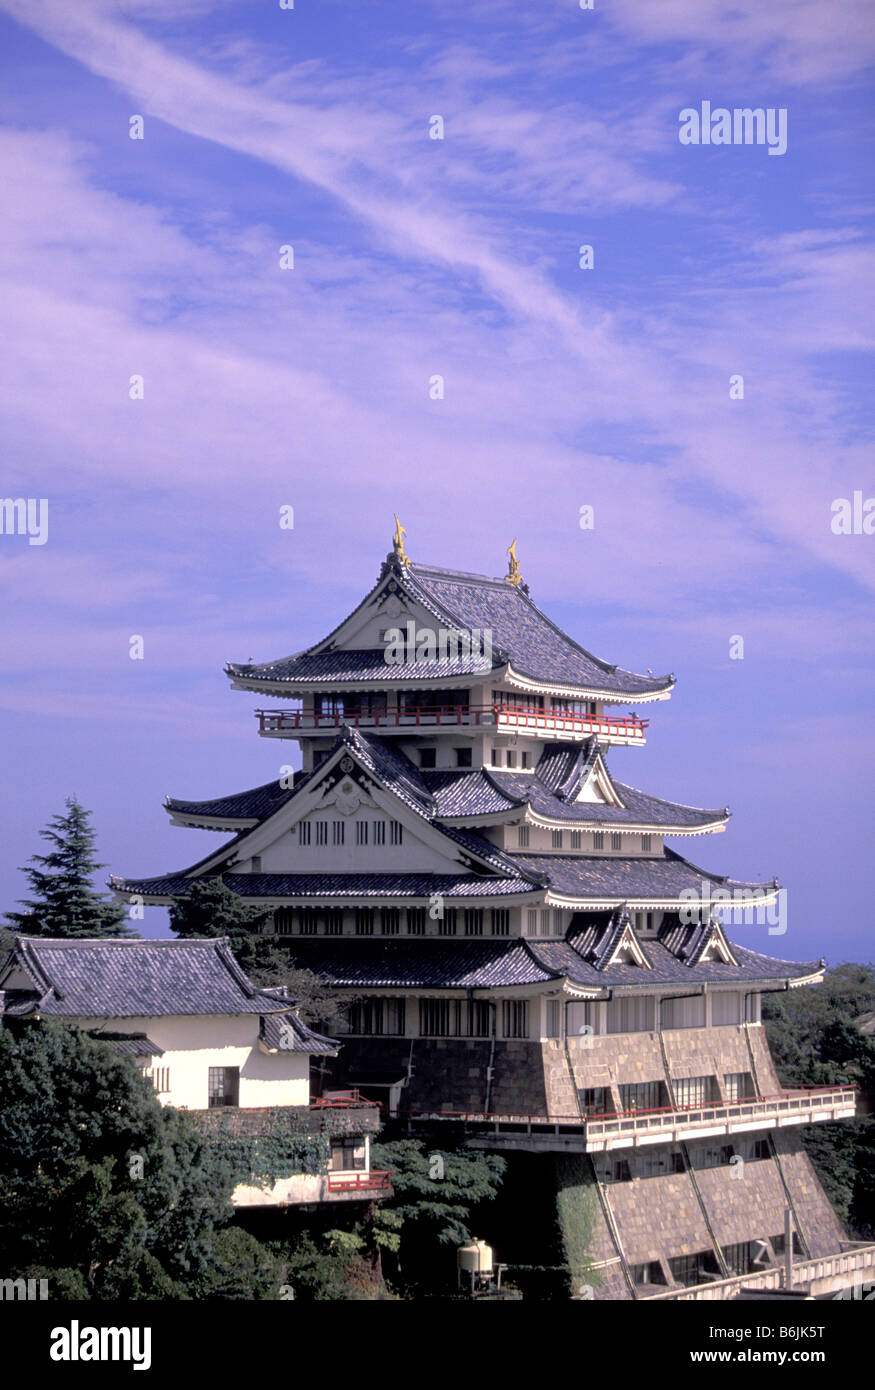 Izu / Atami Japan  city images : ... Japan, western Honshu, Atami, Izu, Hanto Peninsula, Atami, jo Castle